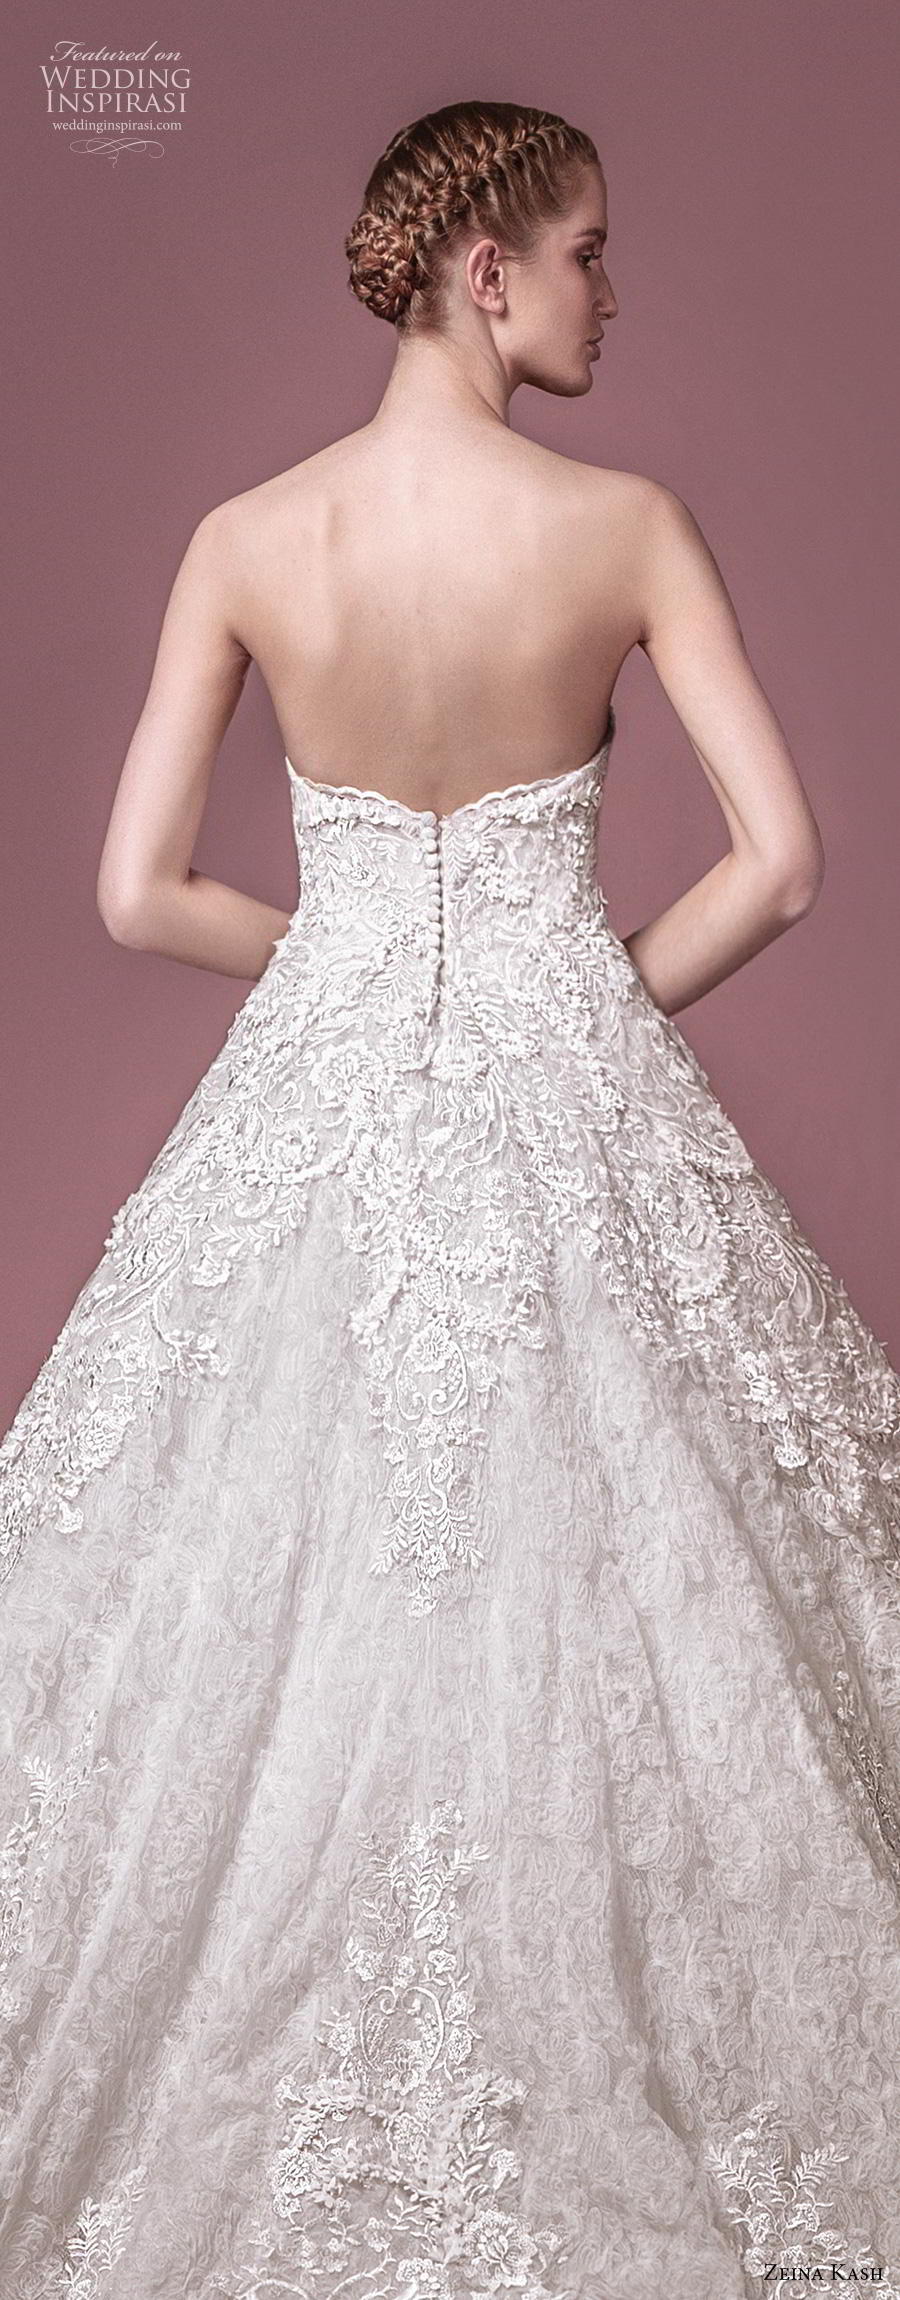 zeina kash 2018 bridal strapless sweetheart neckline full embellishment romantic princess a  line wedding dress mid back chapel train (4) zbv